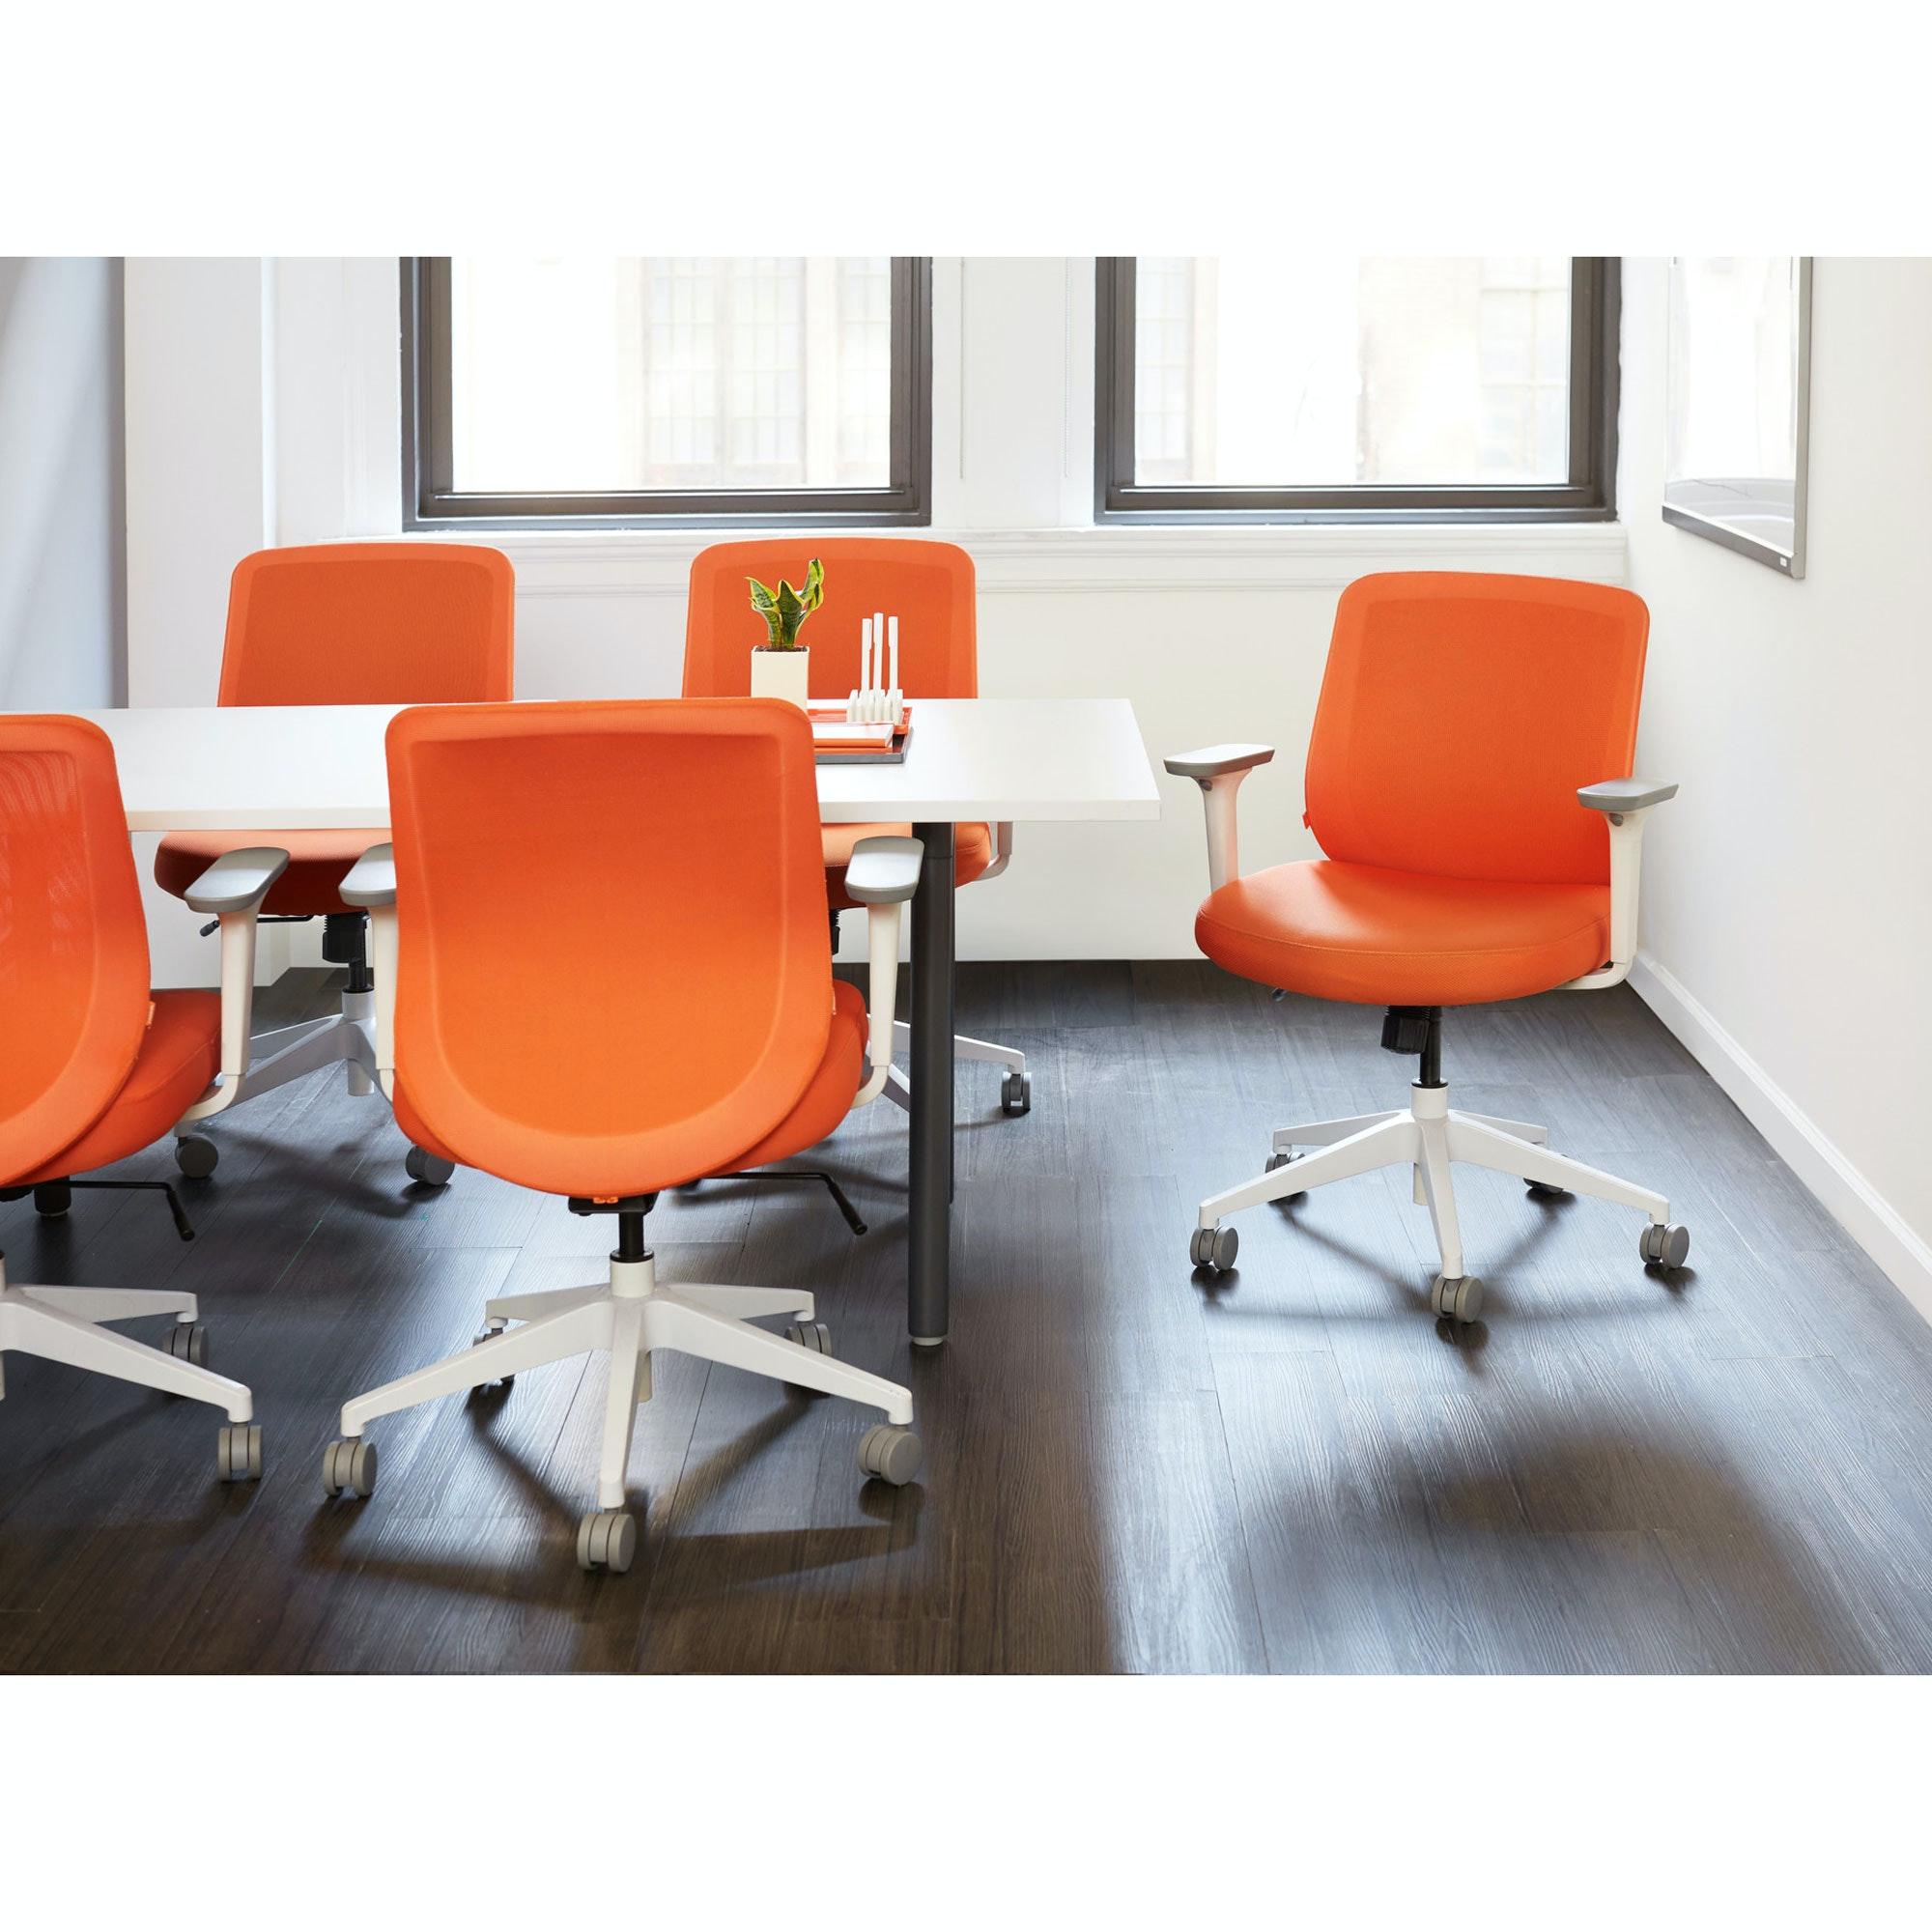 white frame office chair. Office Chairs Photos. Orange Max Task Chair, Mid Back, White Frame,orange Frame Chair